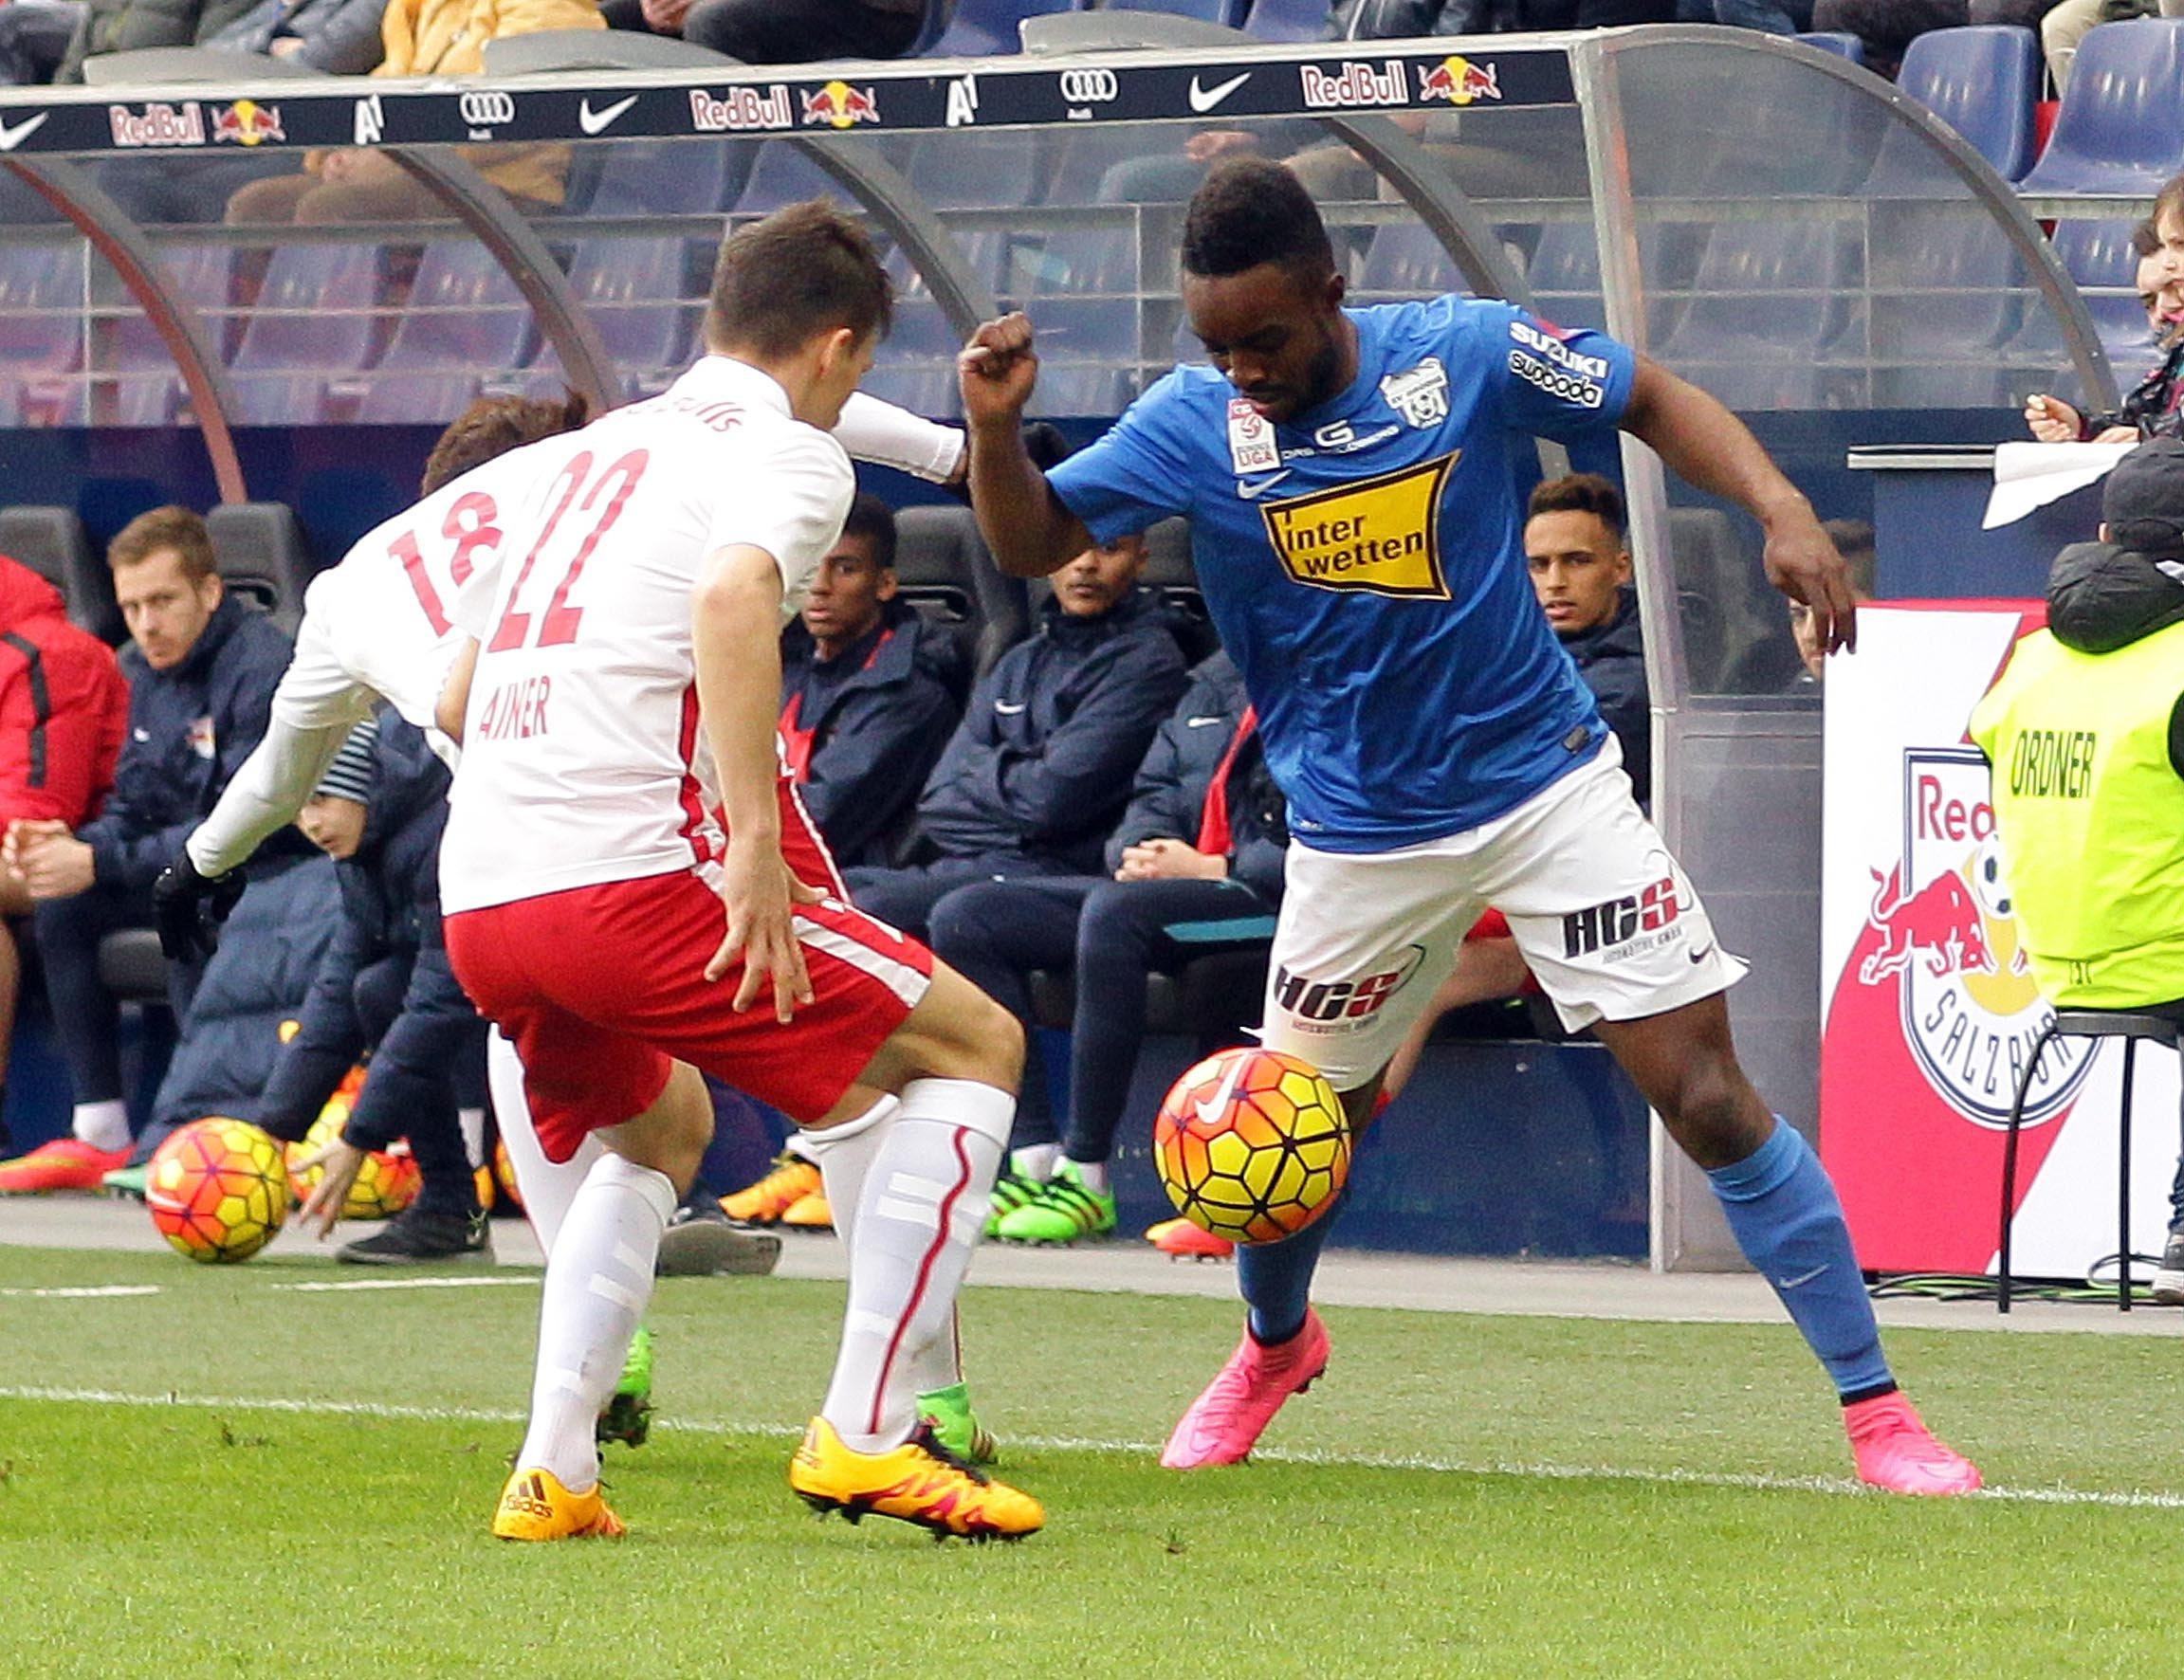 Ofosu in action against Red Bull Salzburg